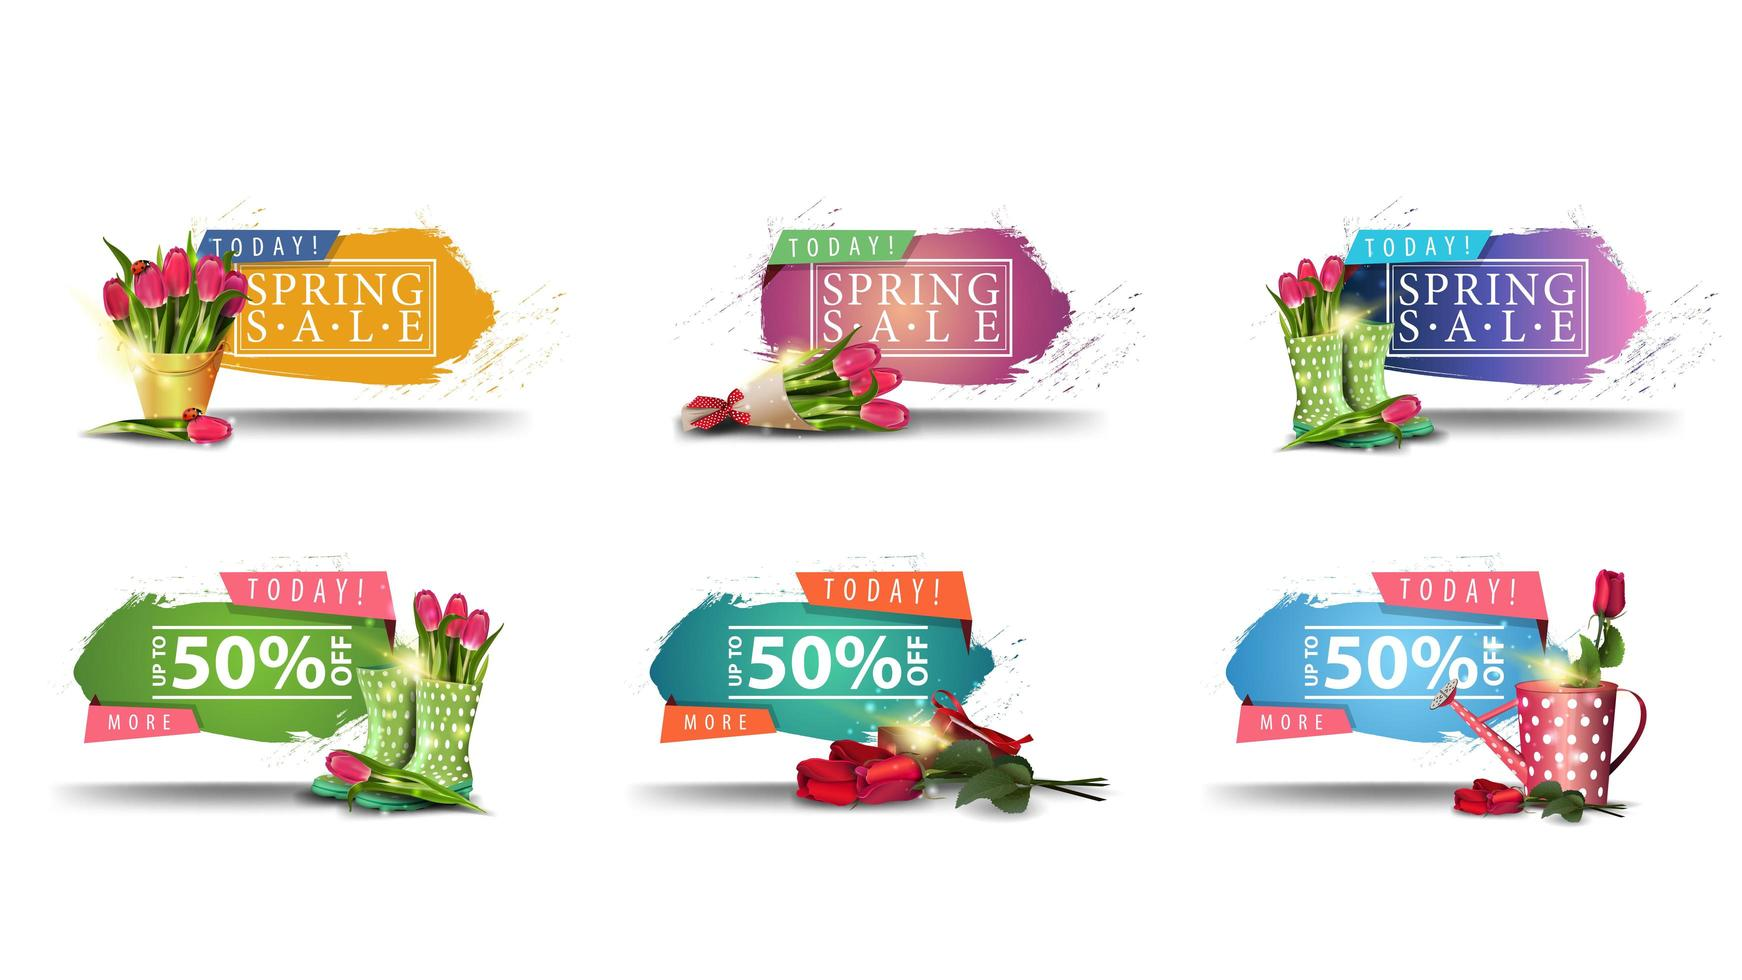 Frühlingsverkaufsbanner mit zerlumpten Kanten und Blumen vektor